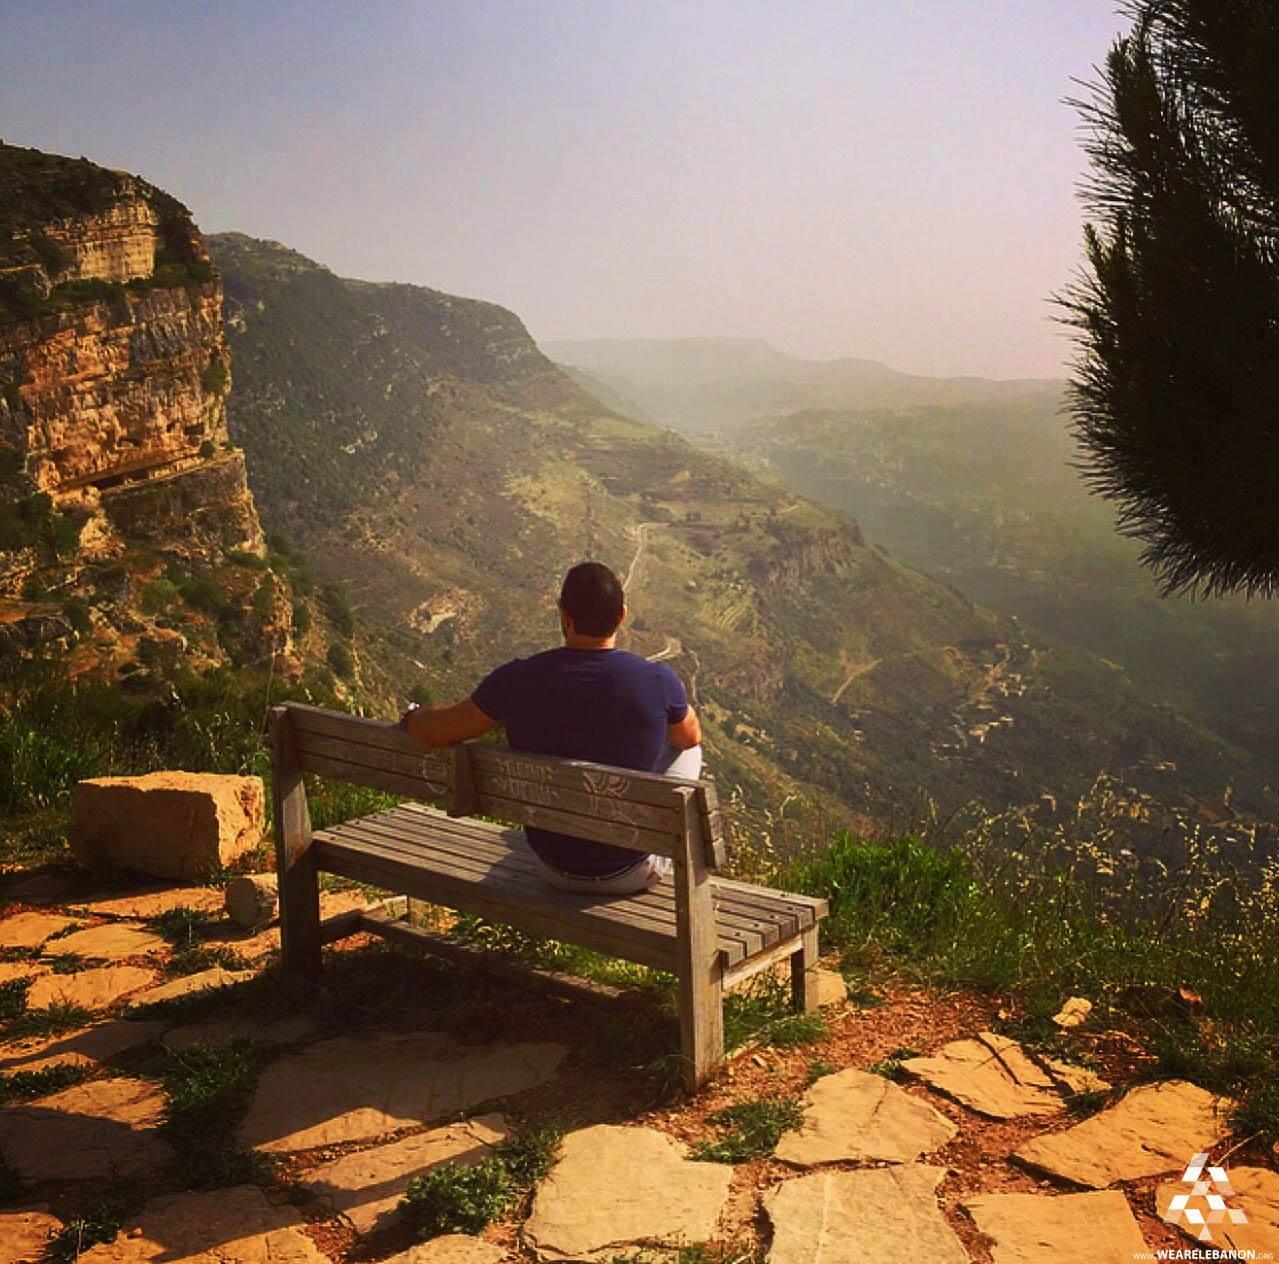 man relaxing overlooking mountain